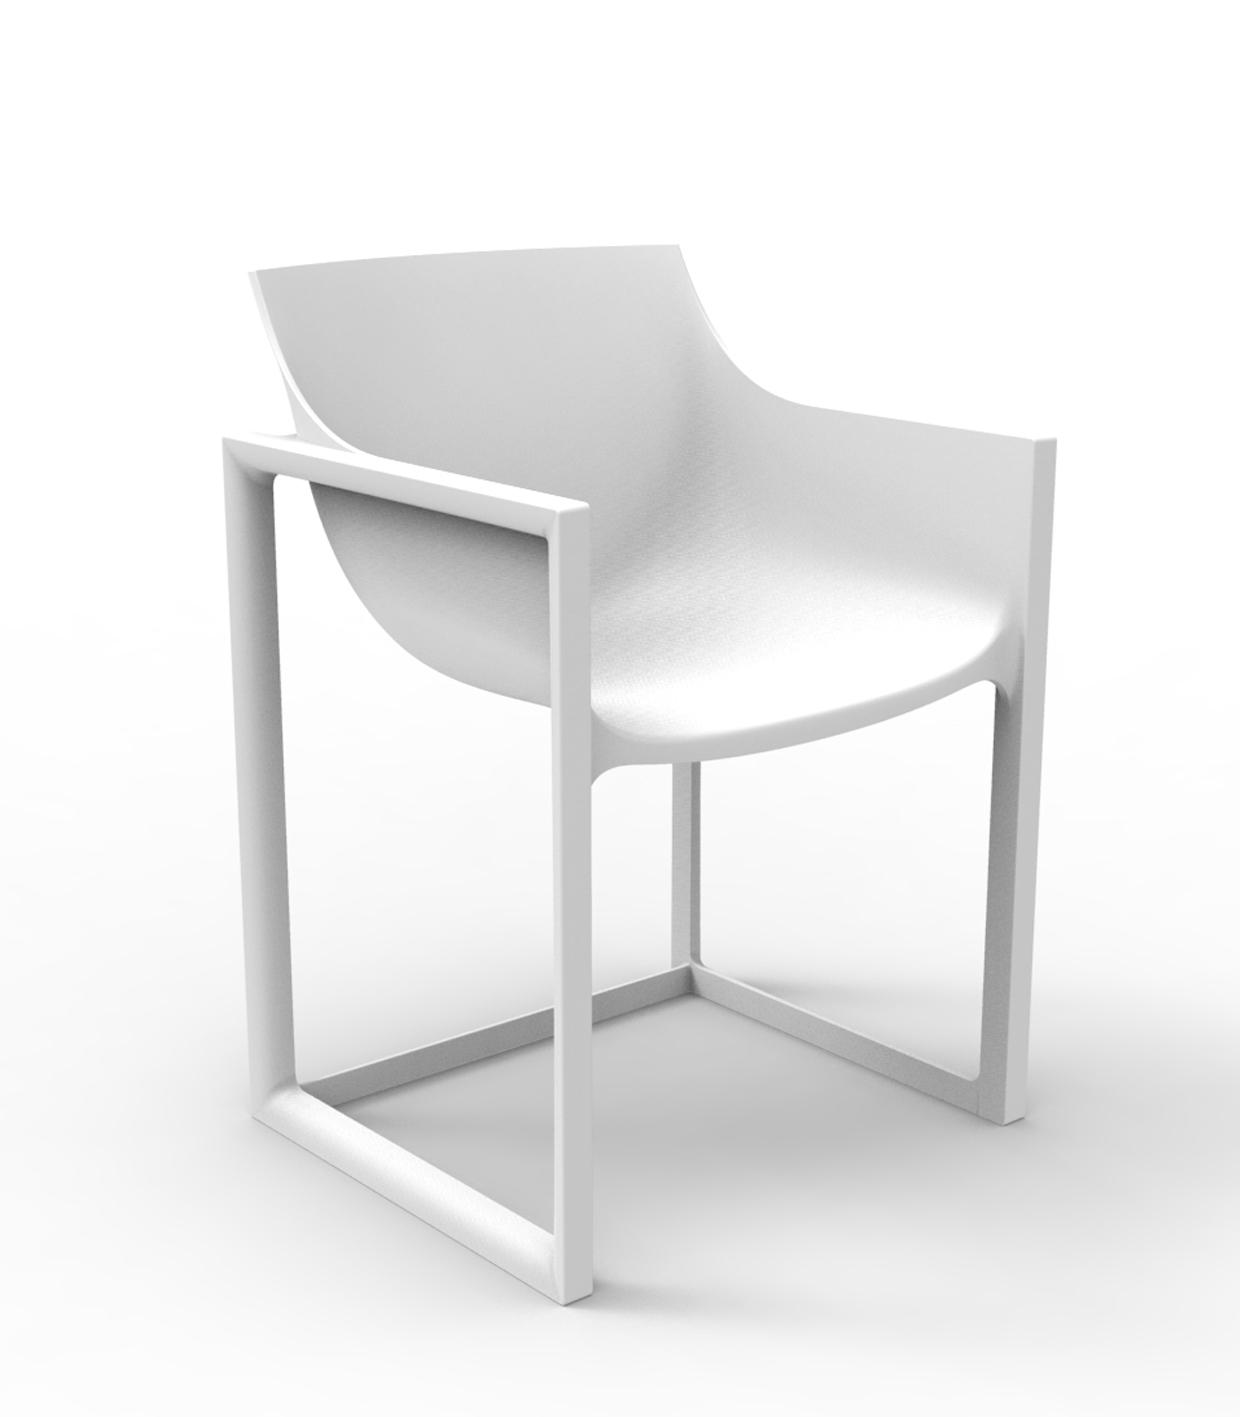 design chair outdoor heavy duty tailgate chairs wall street restaurant armchair by vondom